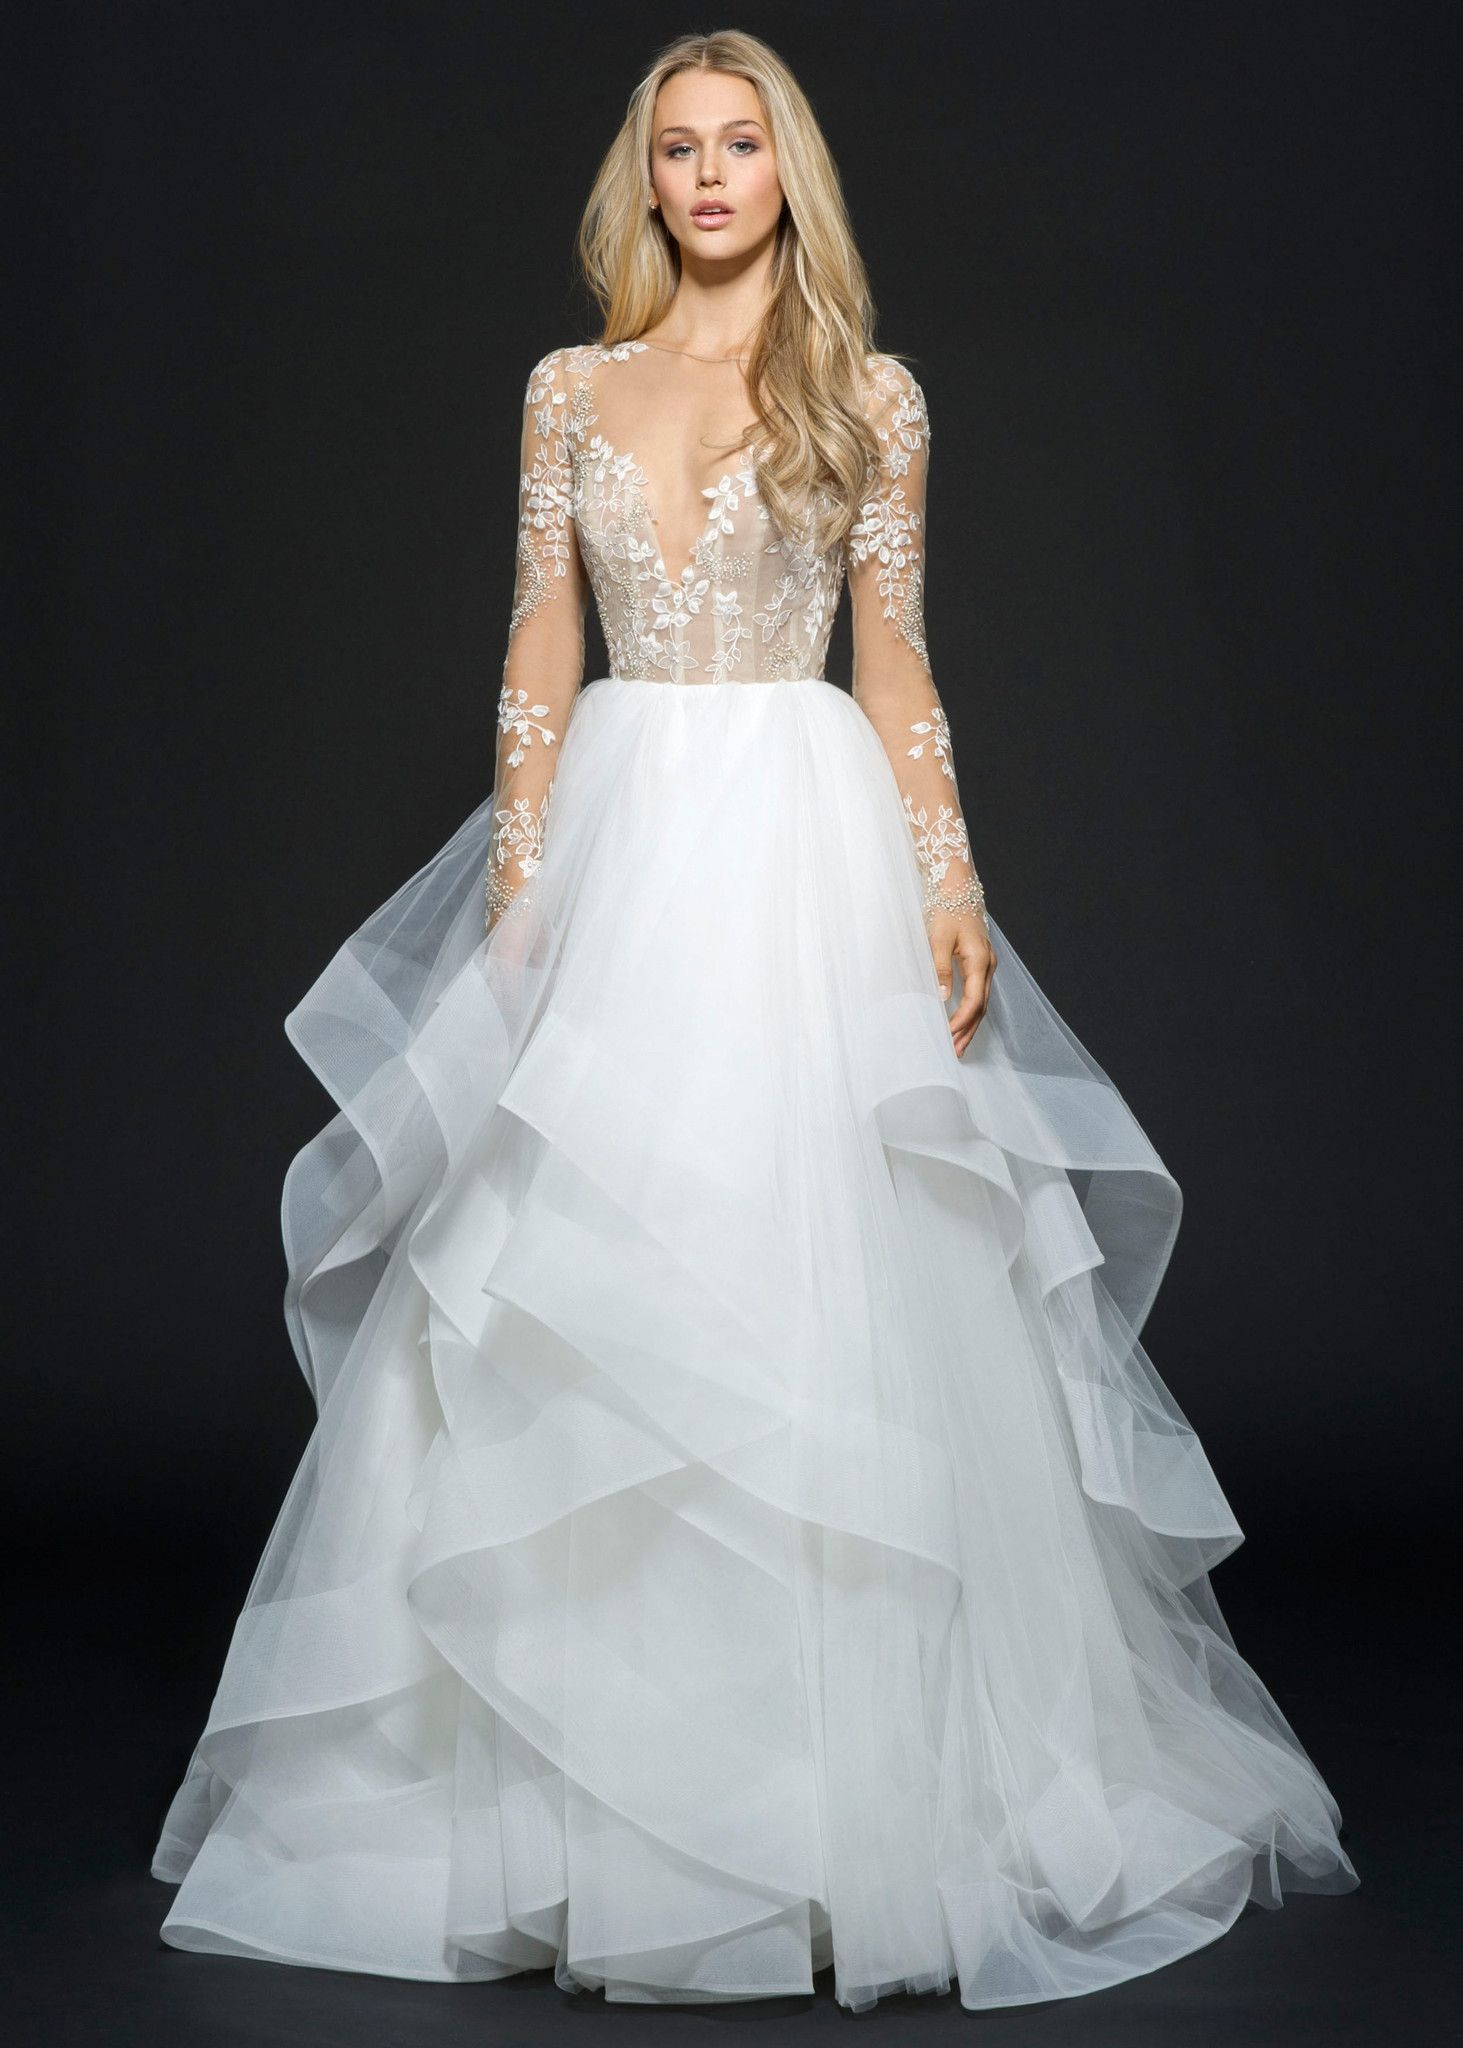 Lorelei | Bridal wear | Pinterest | Dress ideas, Wedding dress and ...